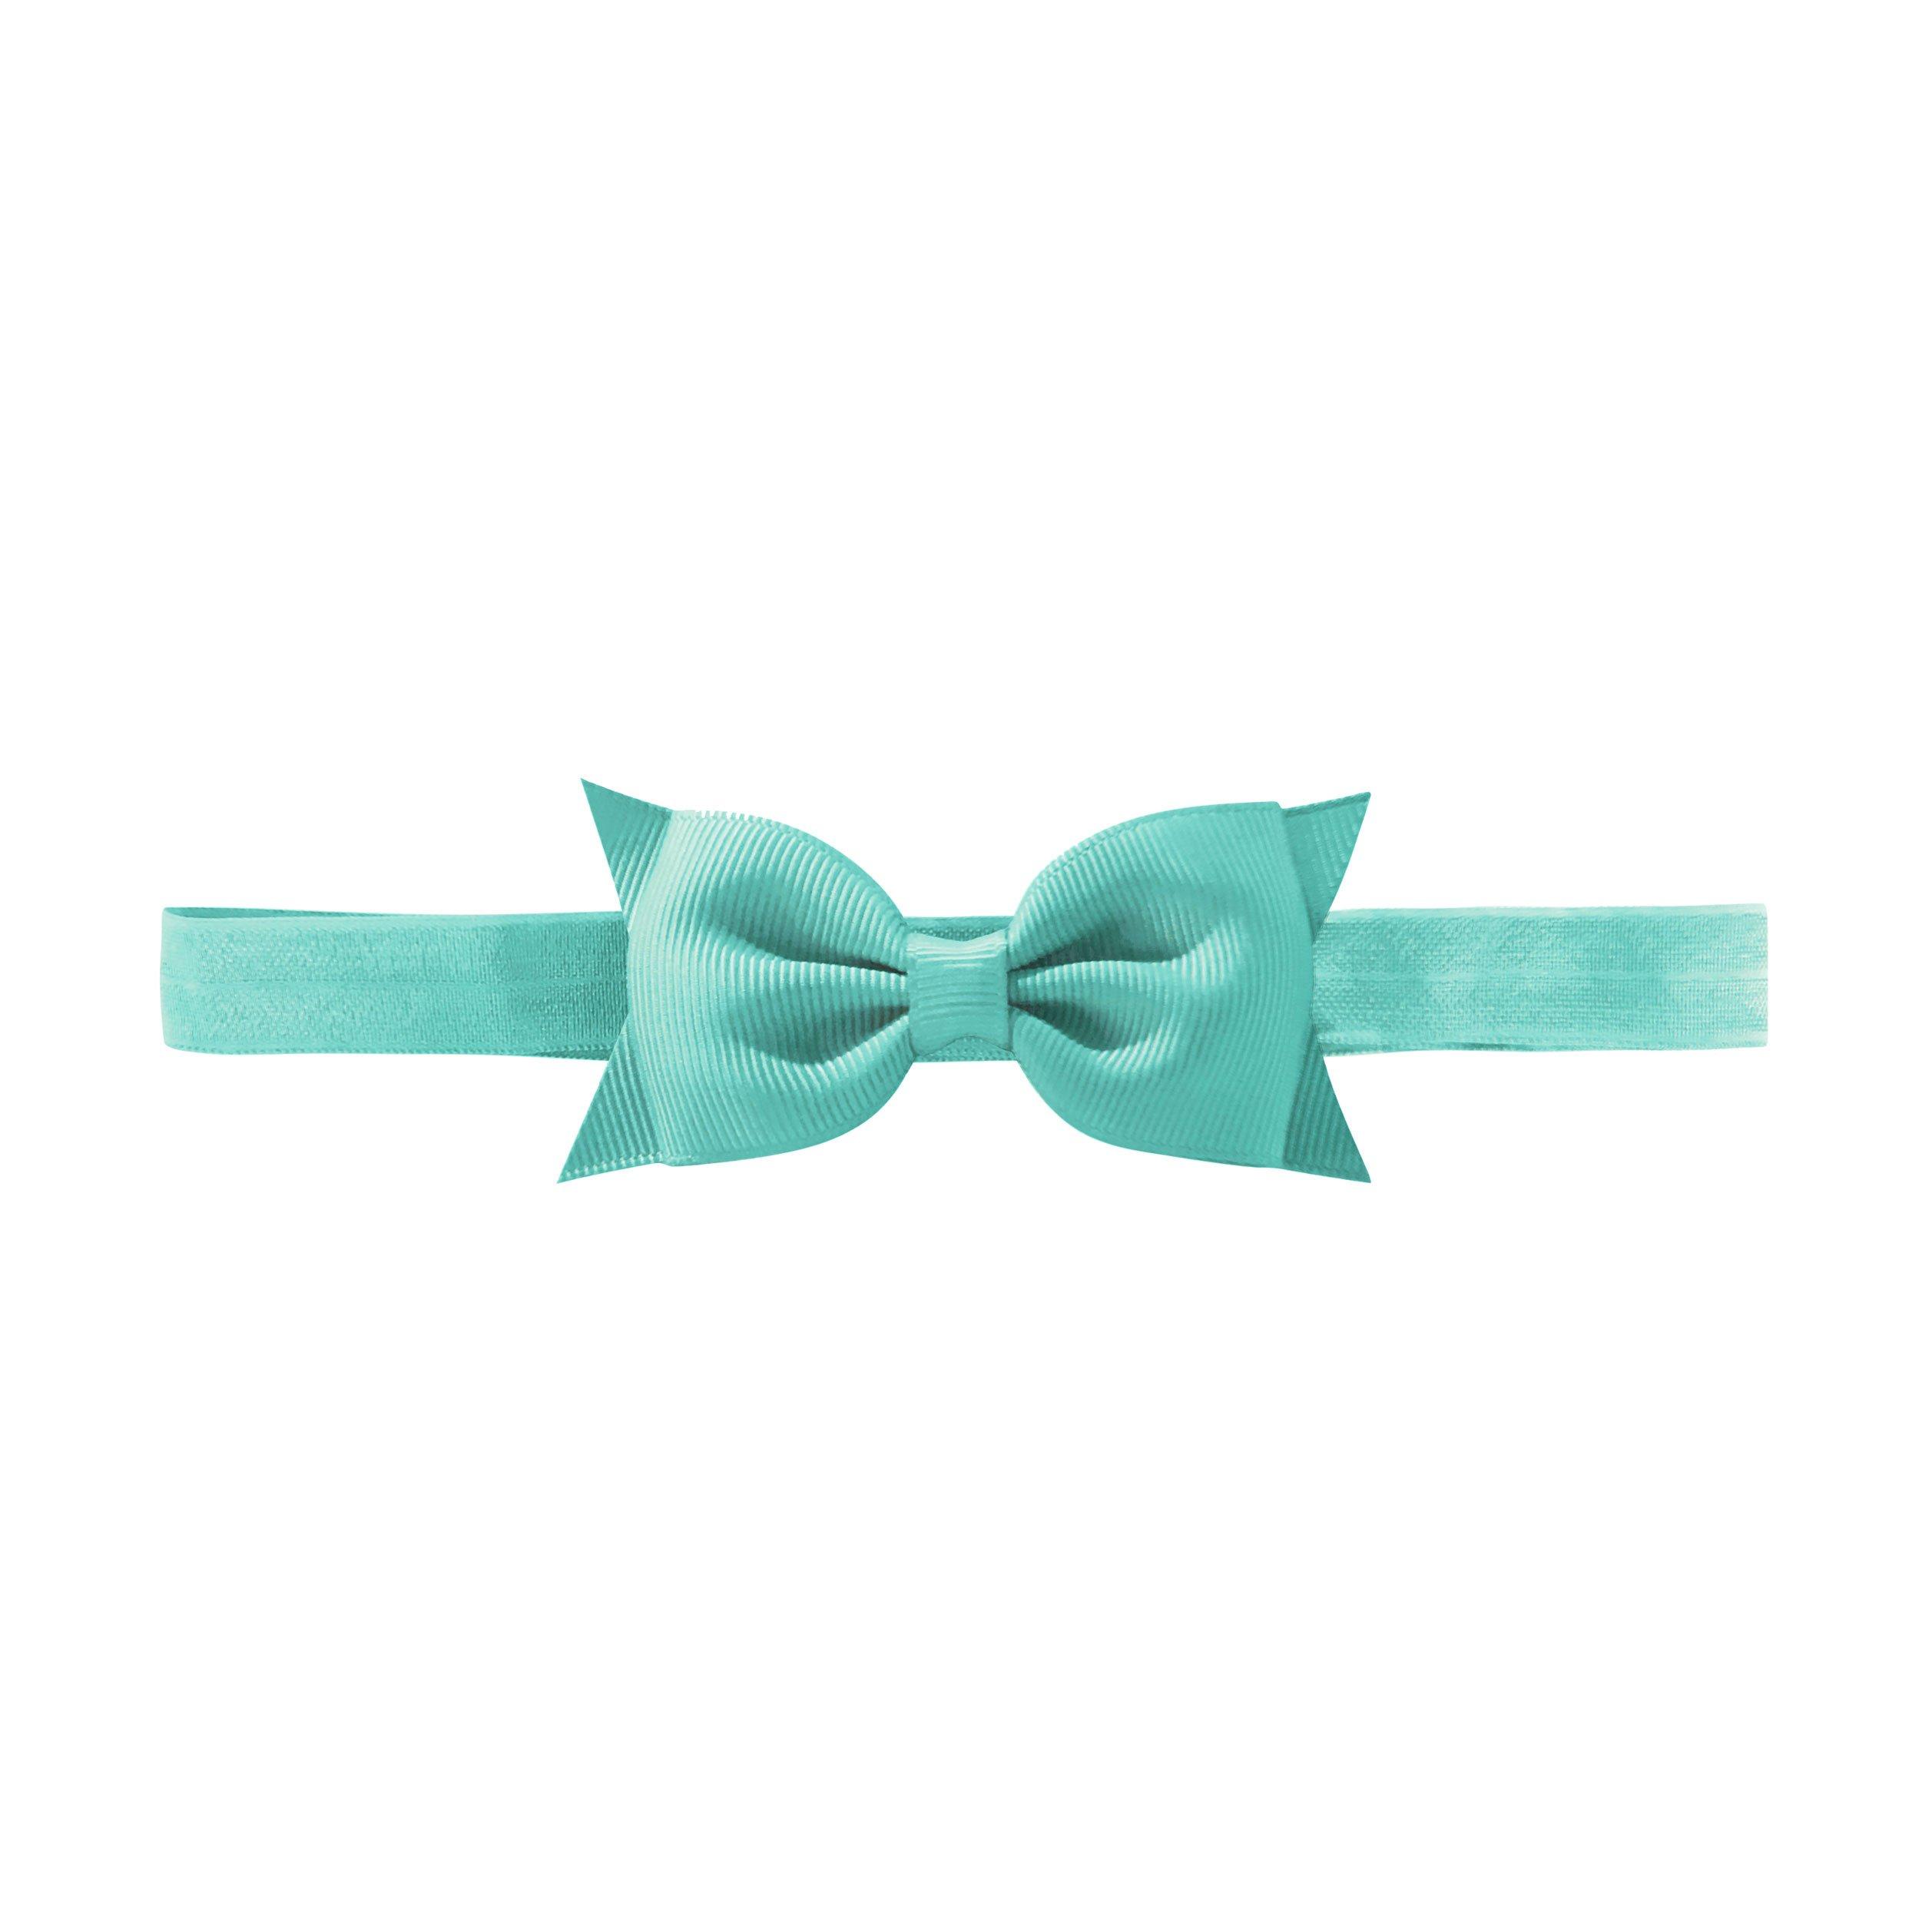 Image of Milledeux double Bowtie bow - elastic hairband - aqua